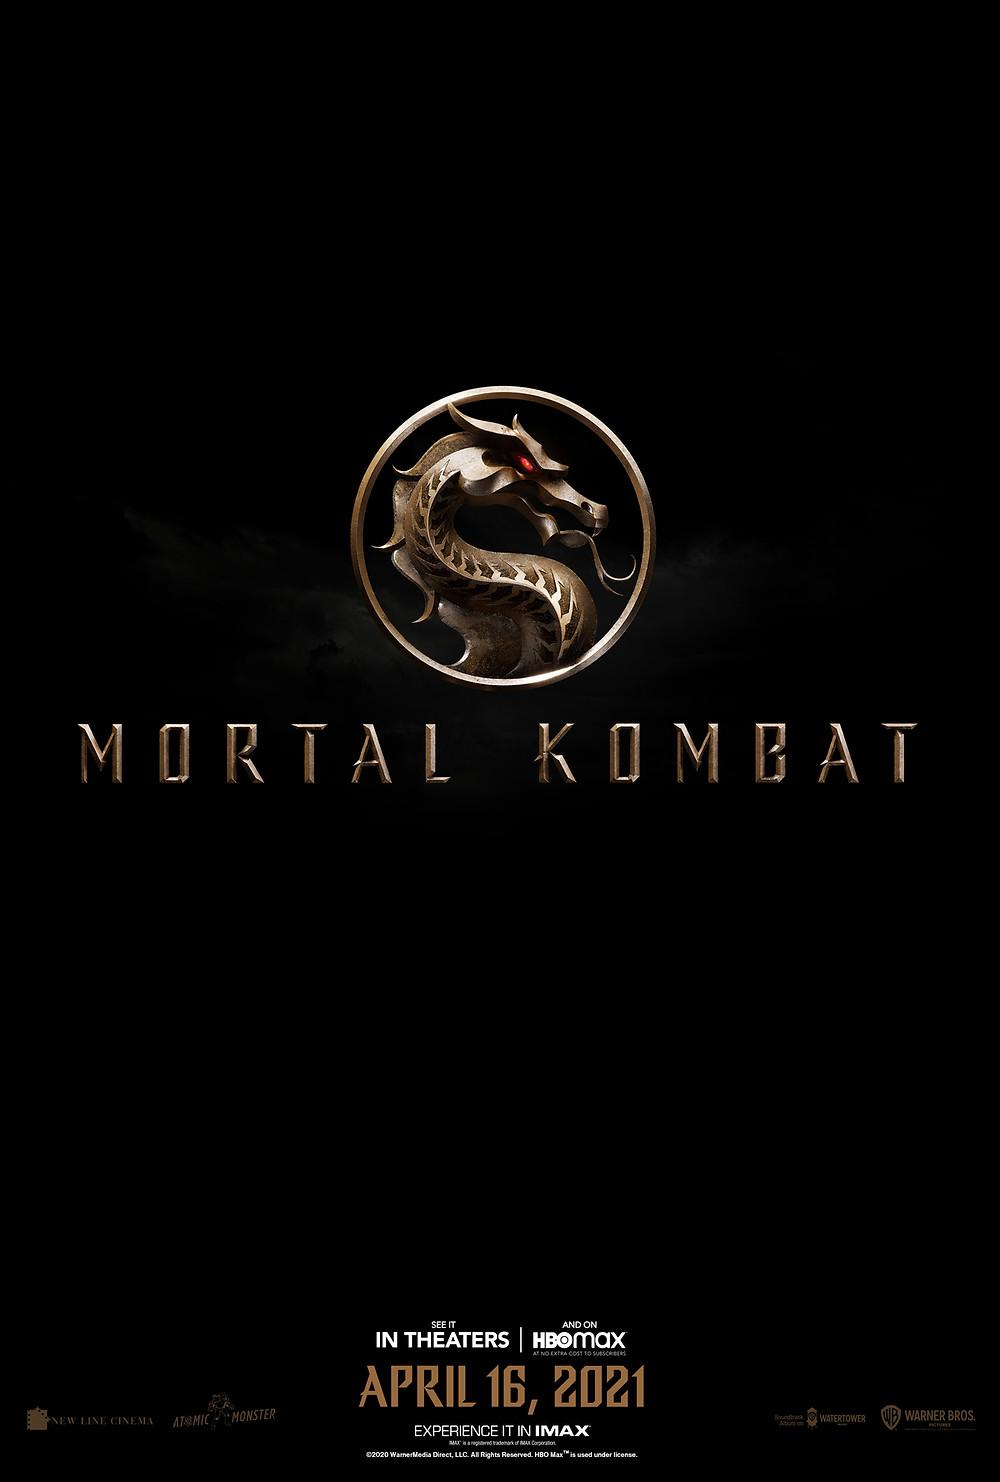 O novo cartaz e logótipo de Mortal Kombat.